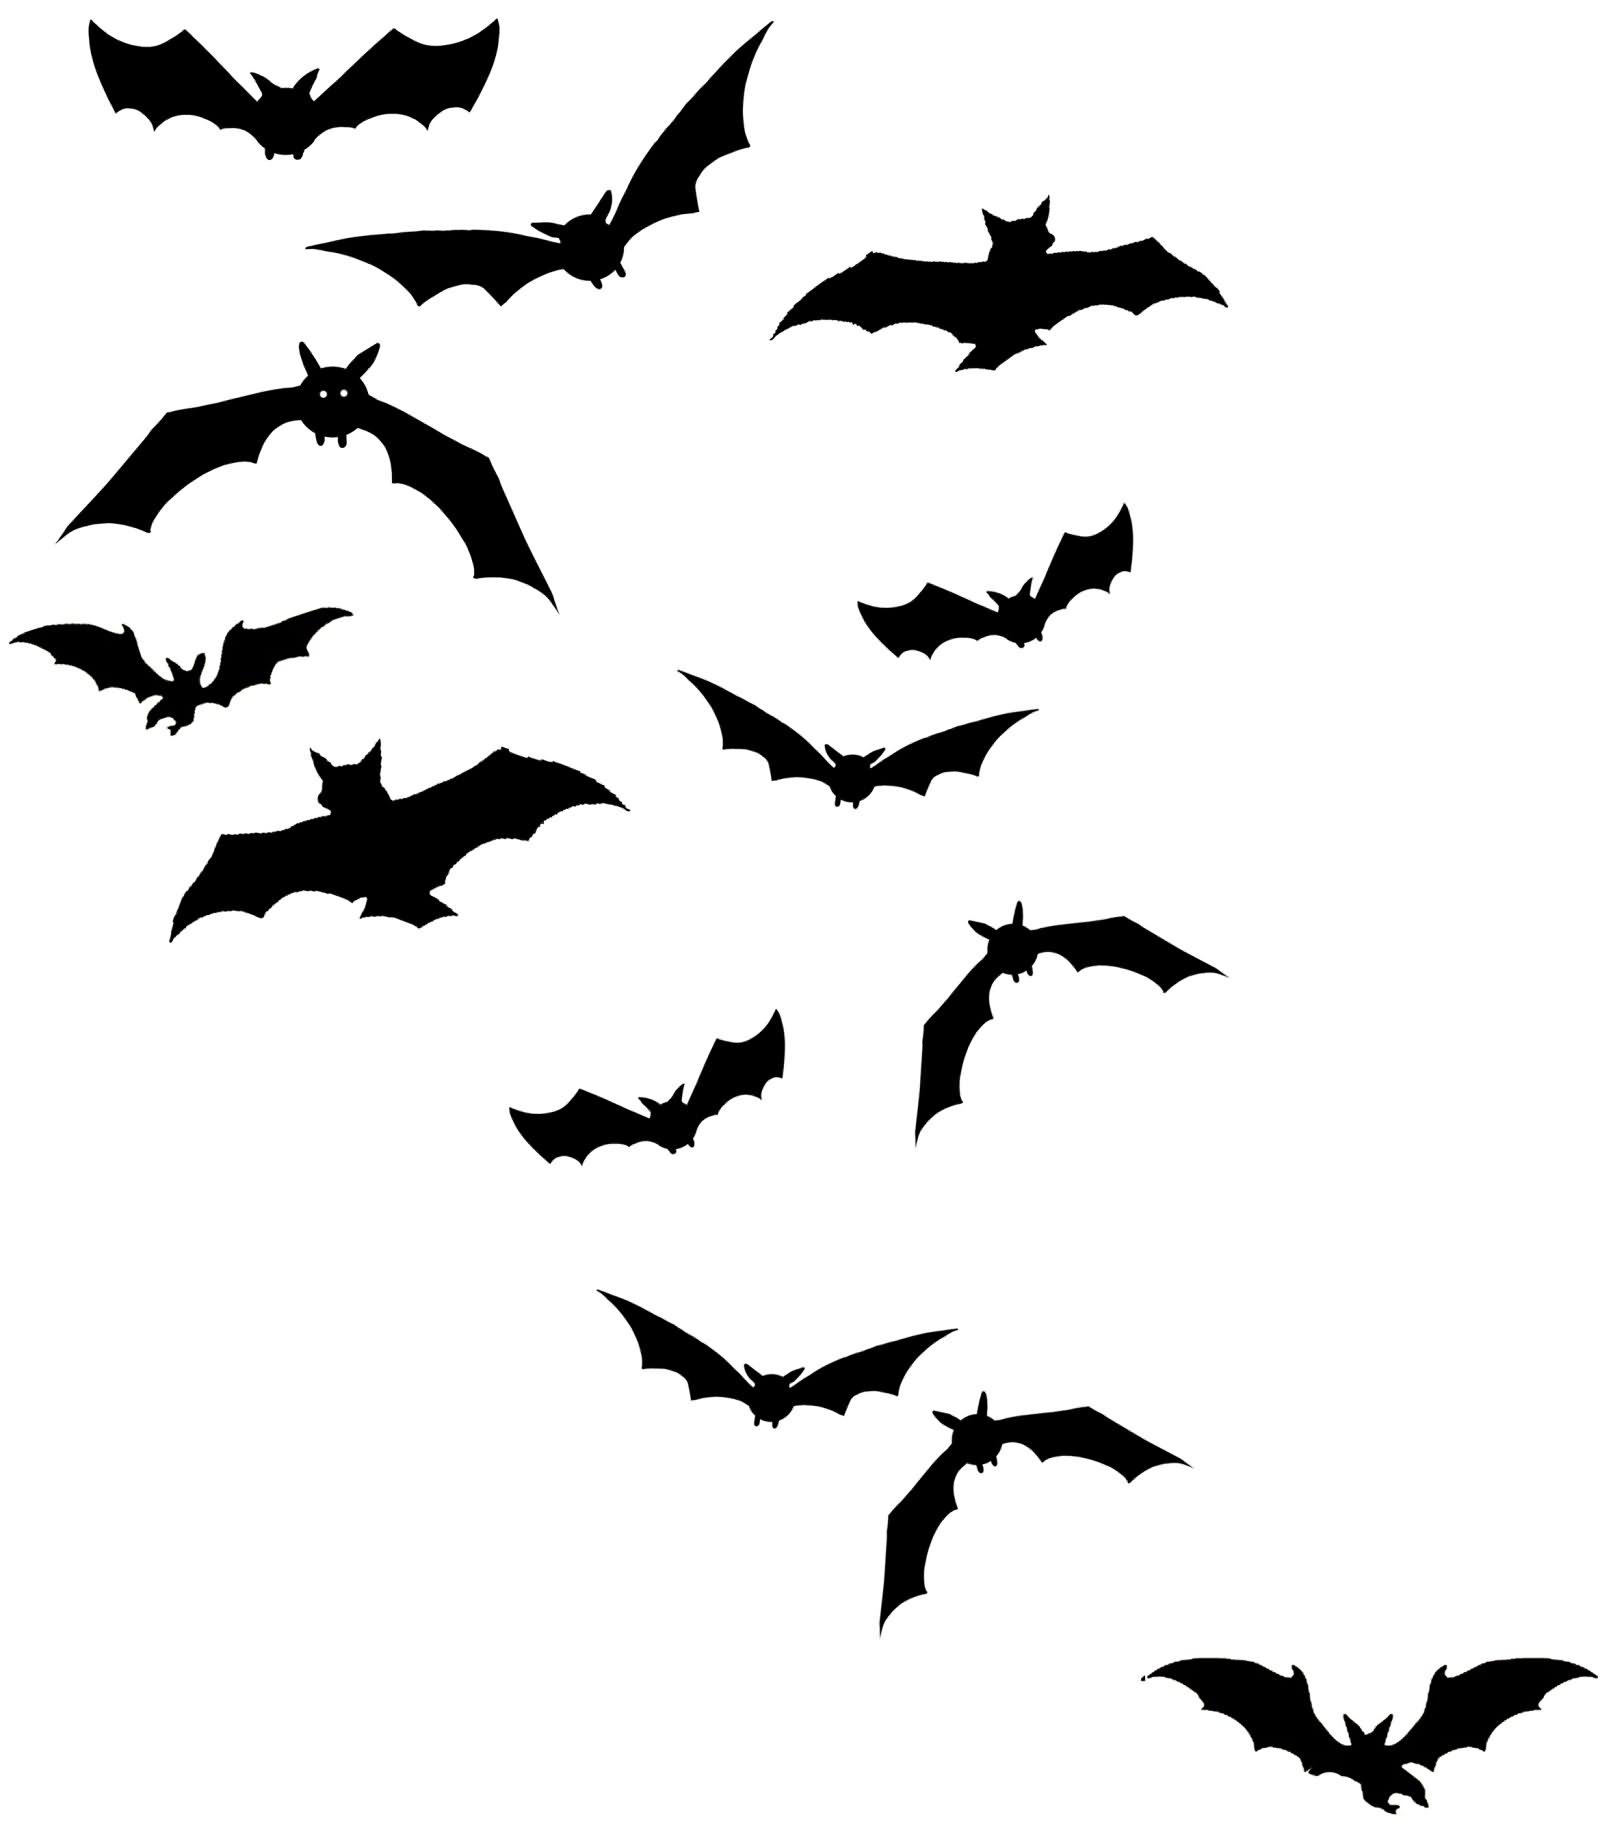 Amazing Black Bats Tattoos Designs